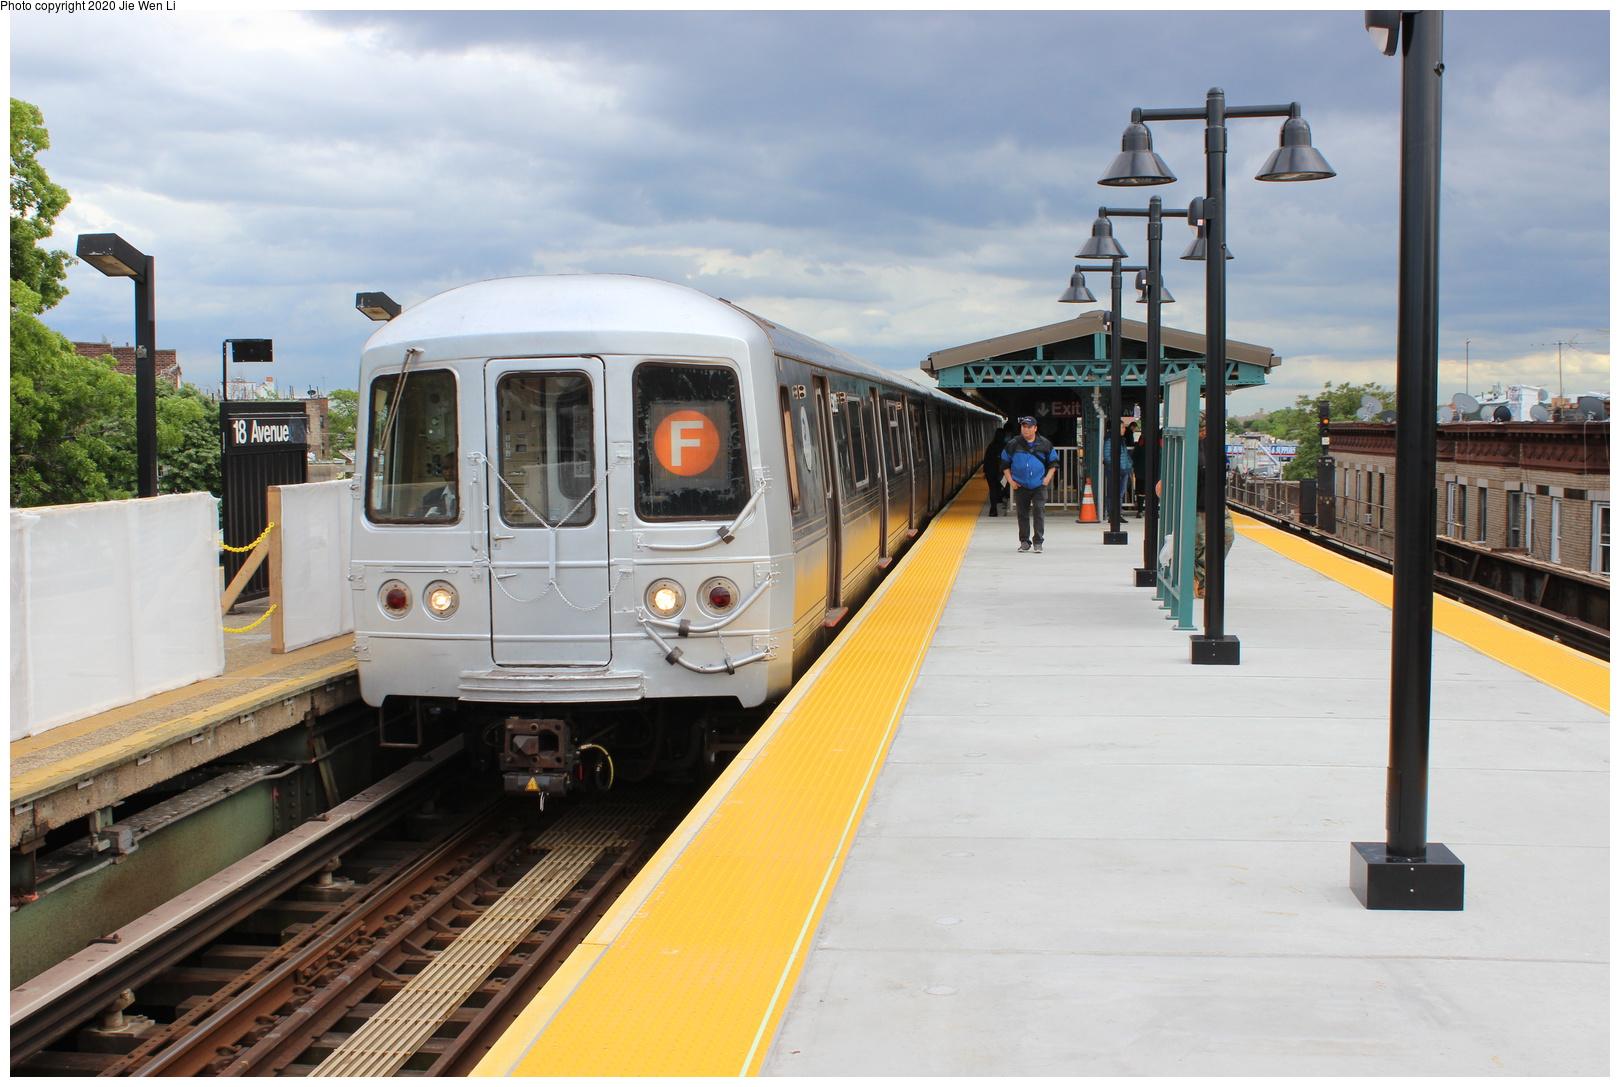 (188k, 1044x726)<br><b>Country:</b> United States<br><b>City:</b> New York<br><b>System:</b> New York City Transit<br><b>Line:</b> BMT Fulton<br><b>Car:</b> BMT C  <br><b>Photo by:</b> Joel Shanus<br><b>Viewed (this week/total):</b> 2 / 3712